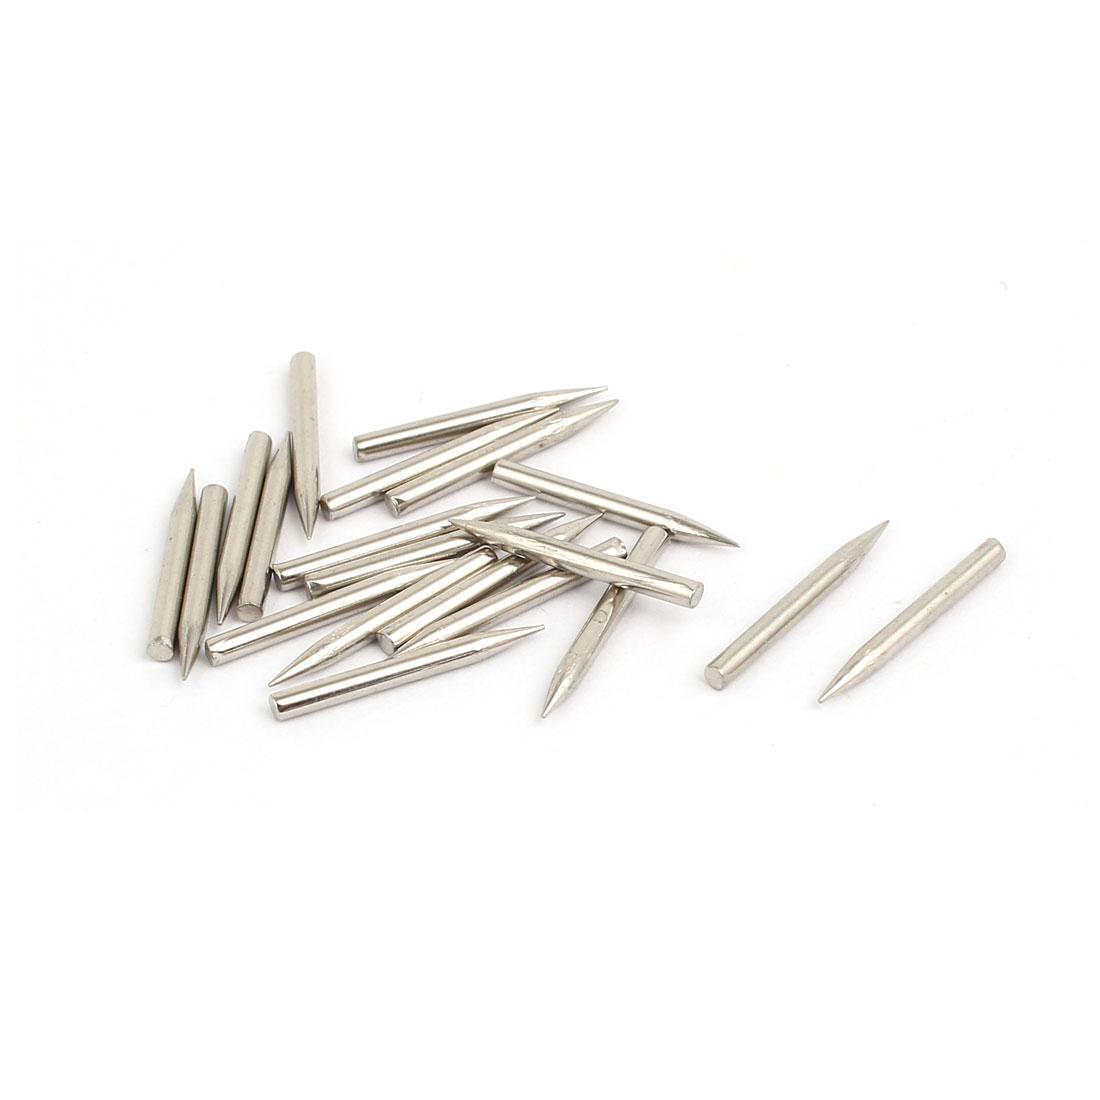 1.4mm x 14mm Carbon Steel Non-Head Siding Wall Cement Nail 20pcs